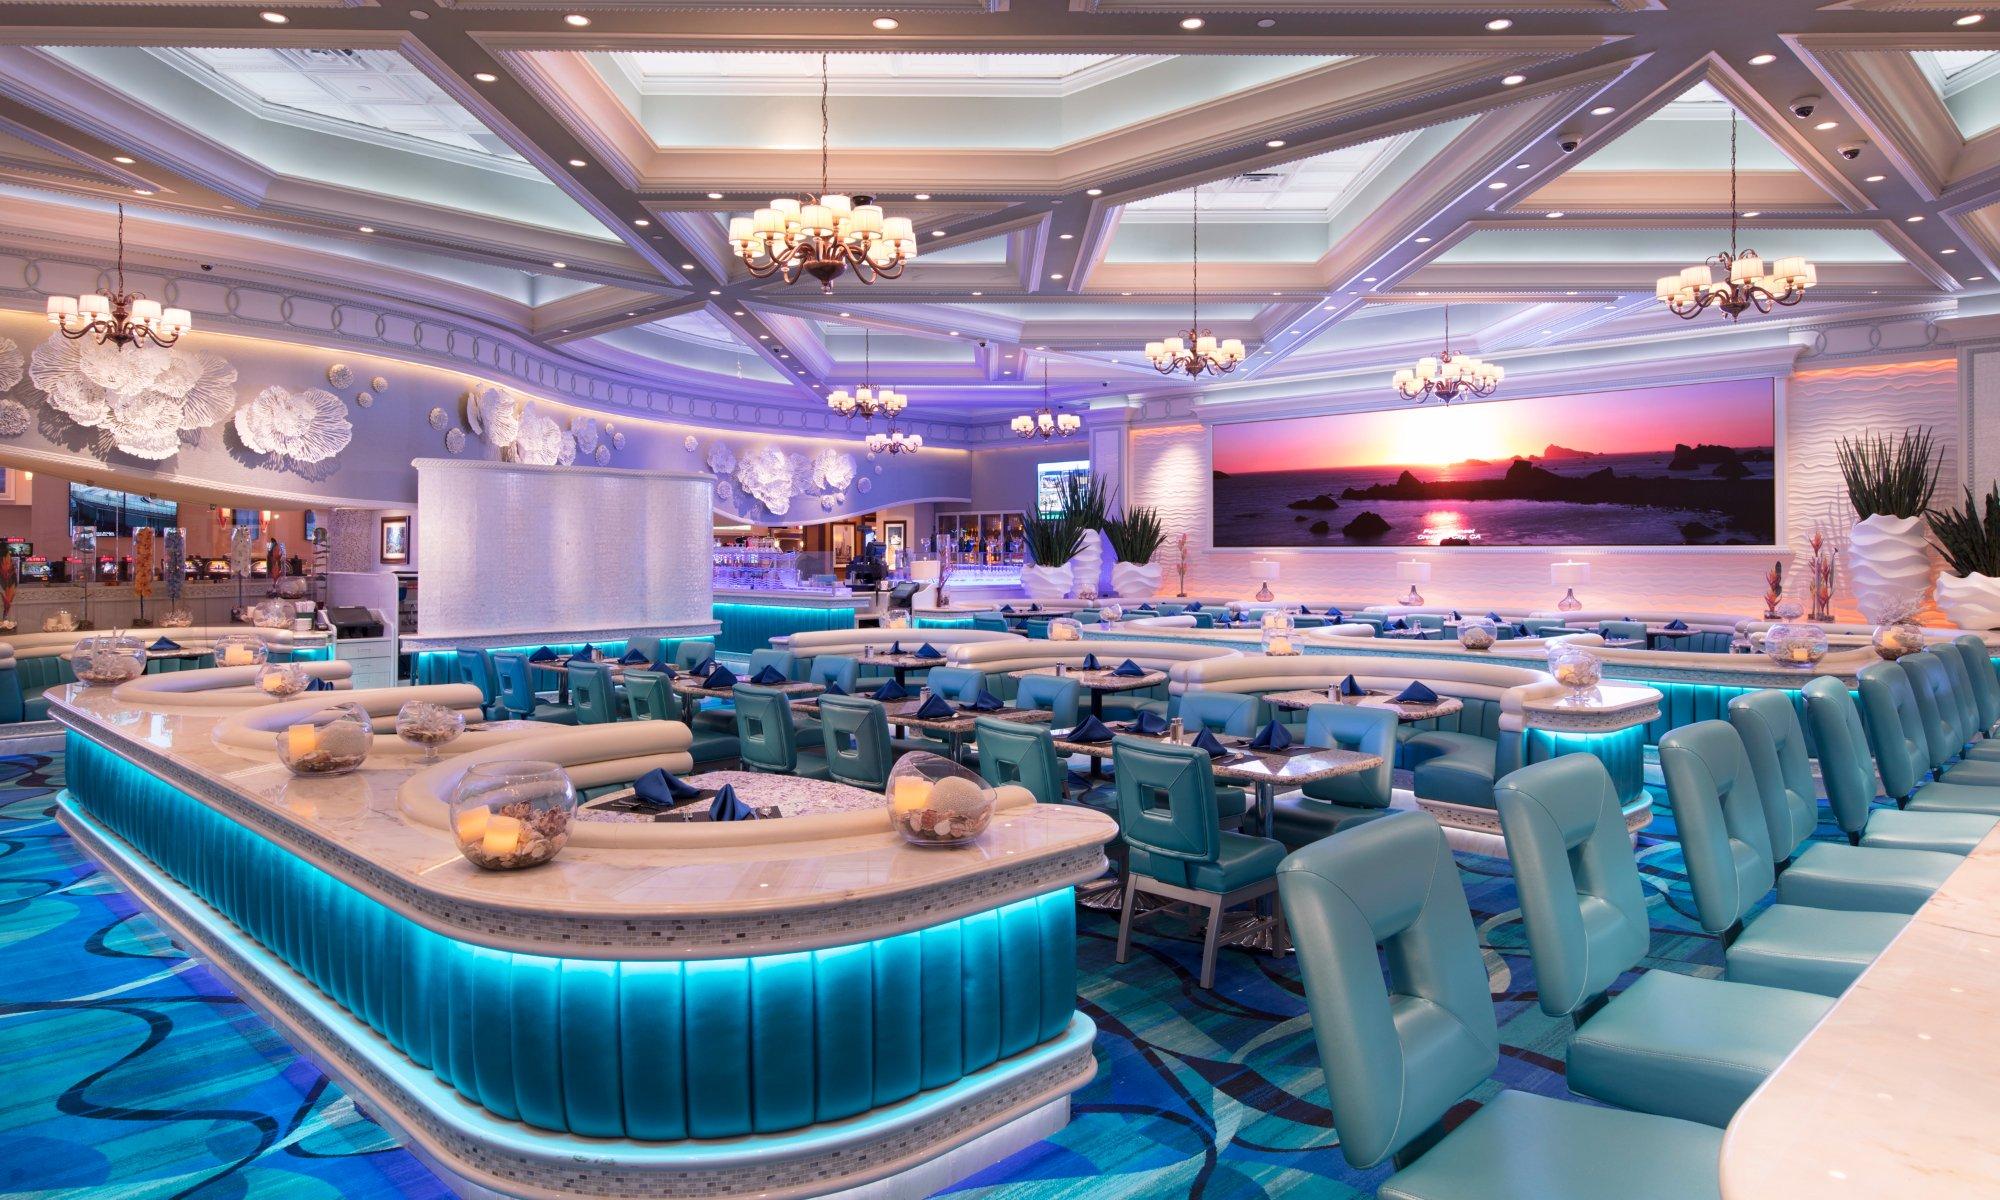 oceano is an ocean themed restaurant in nevada